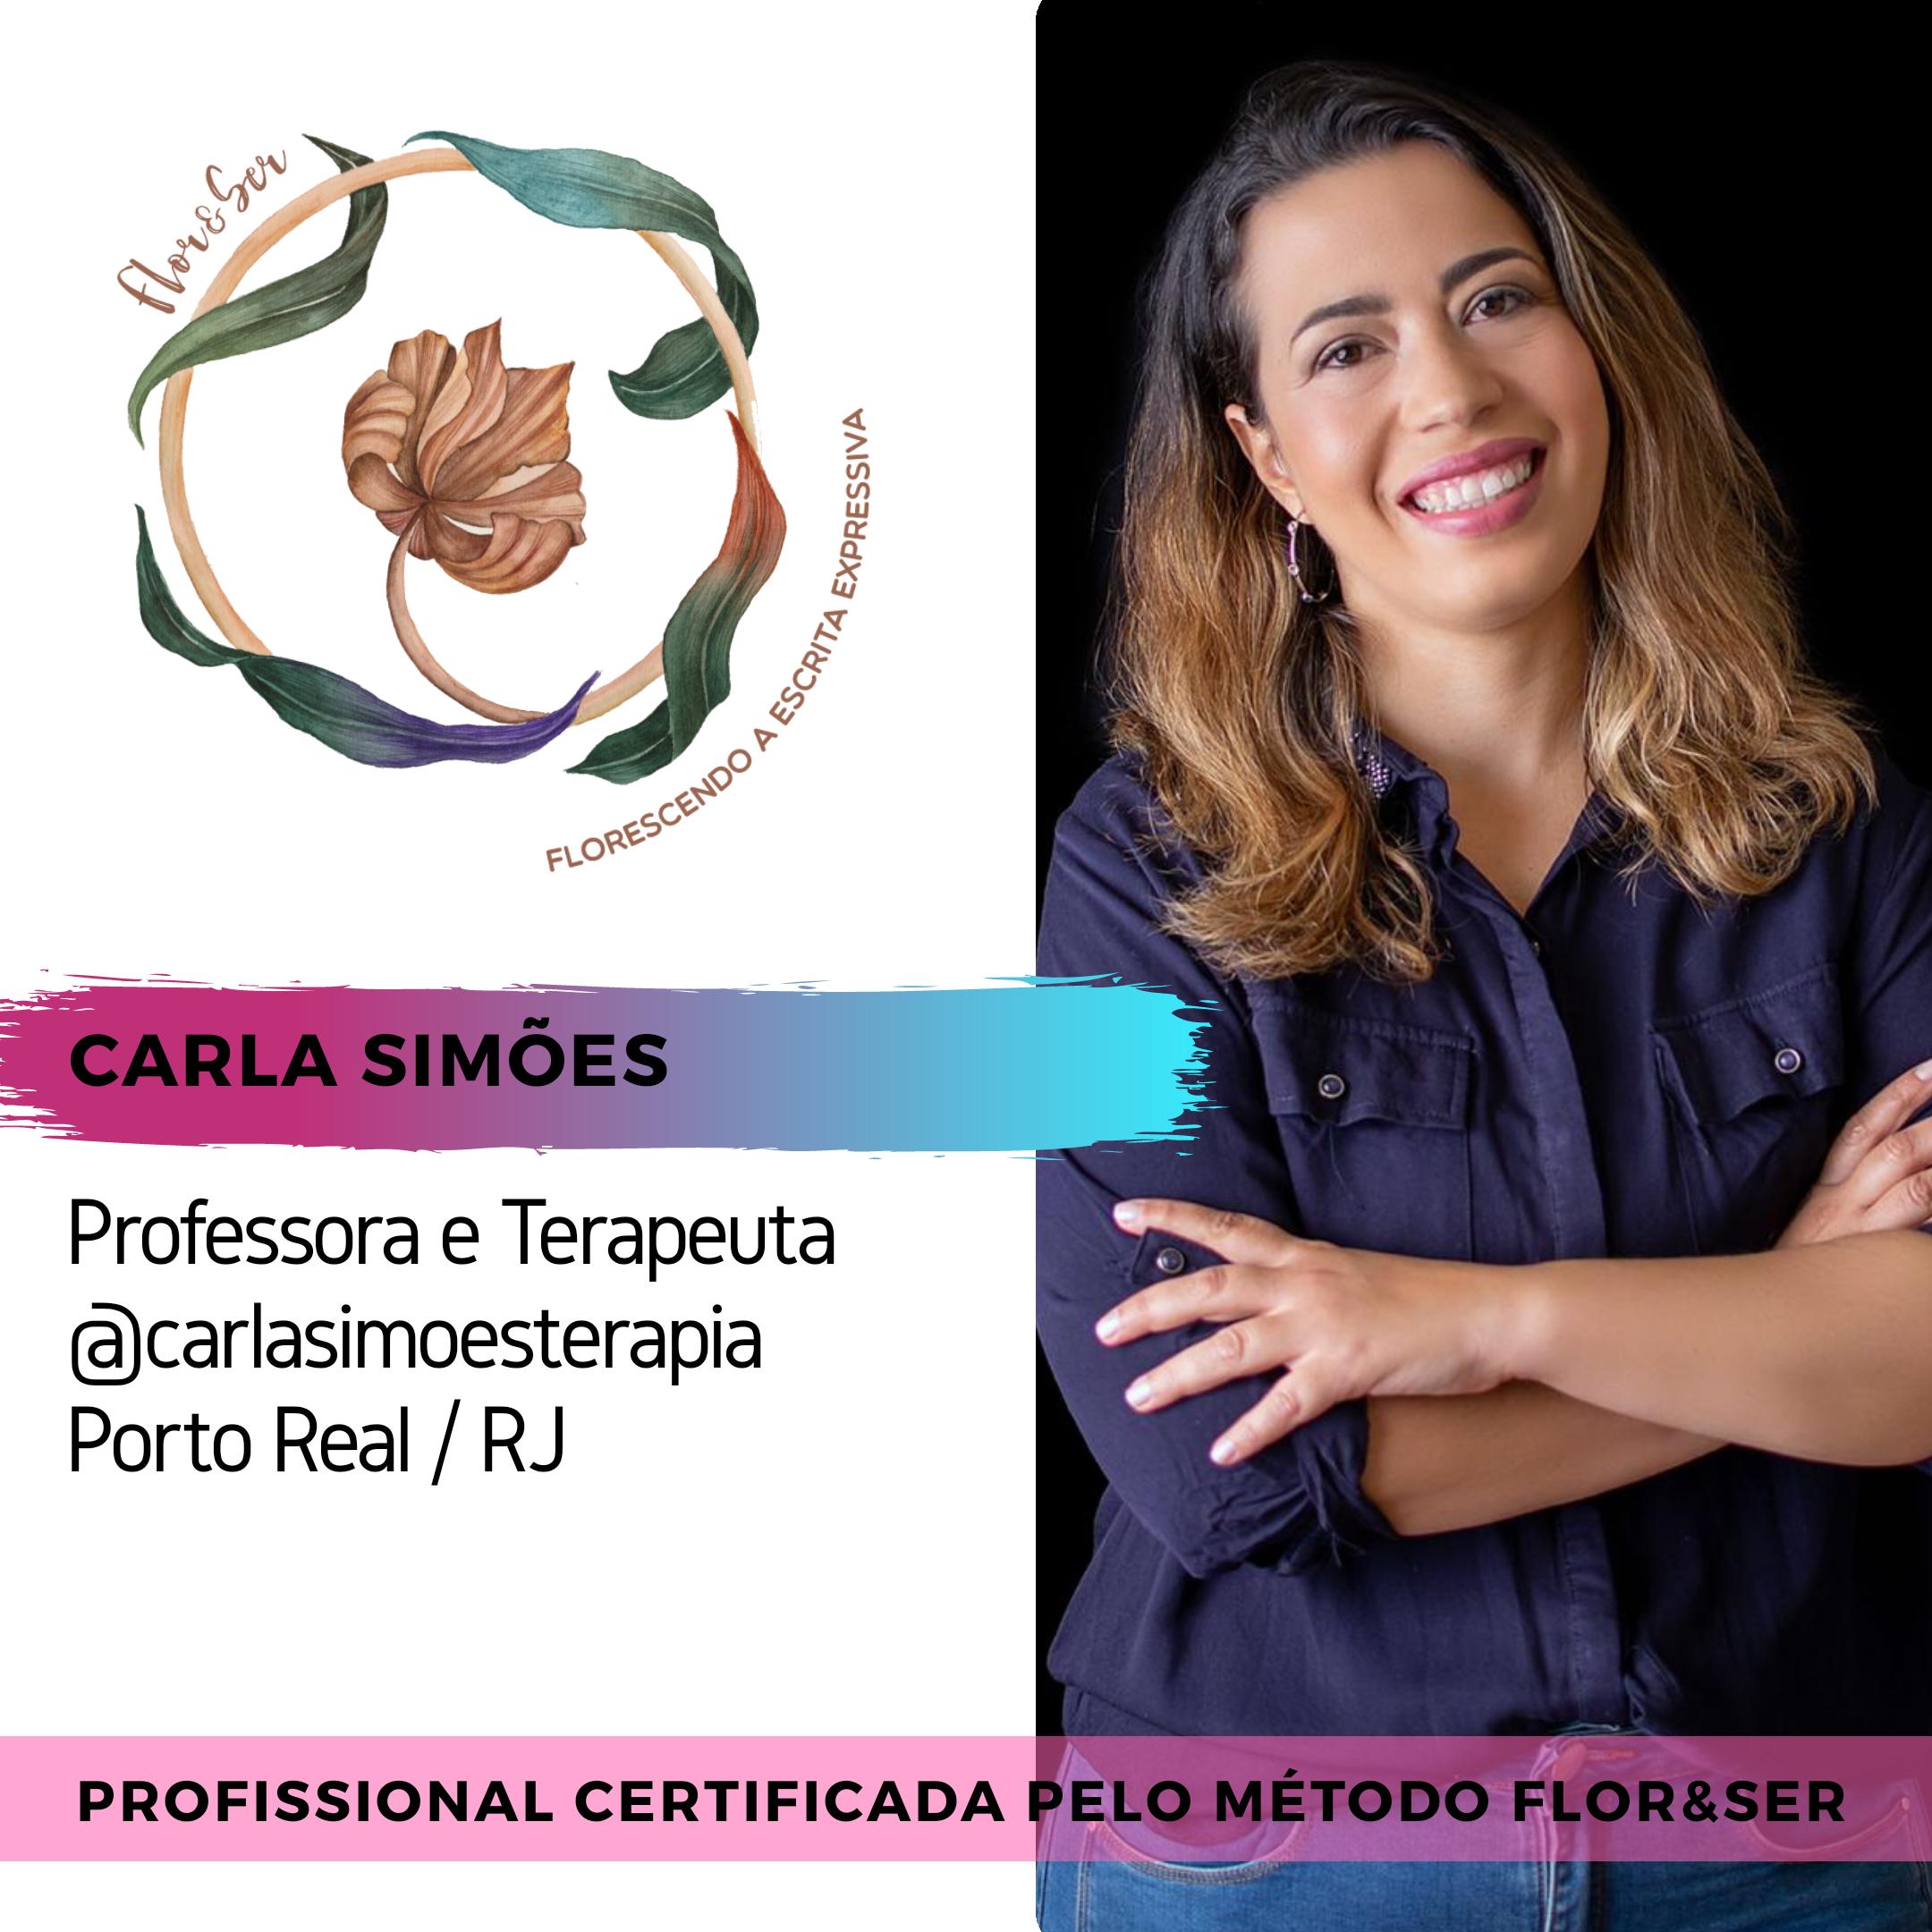 Carla Simões